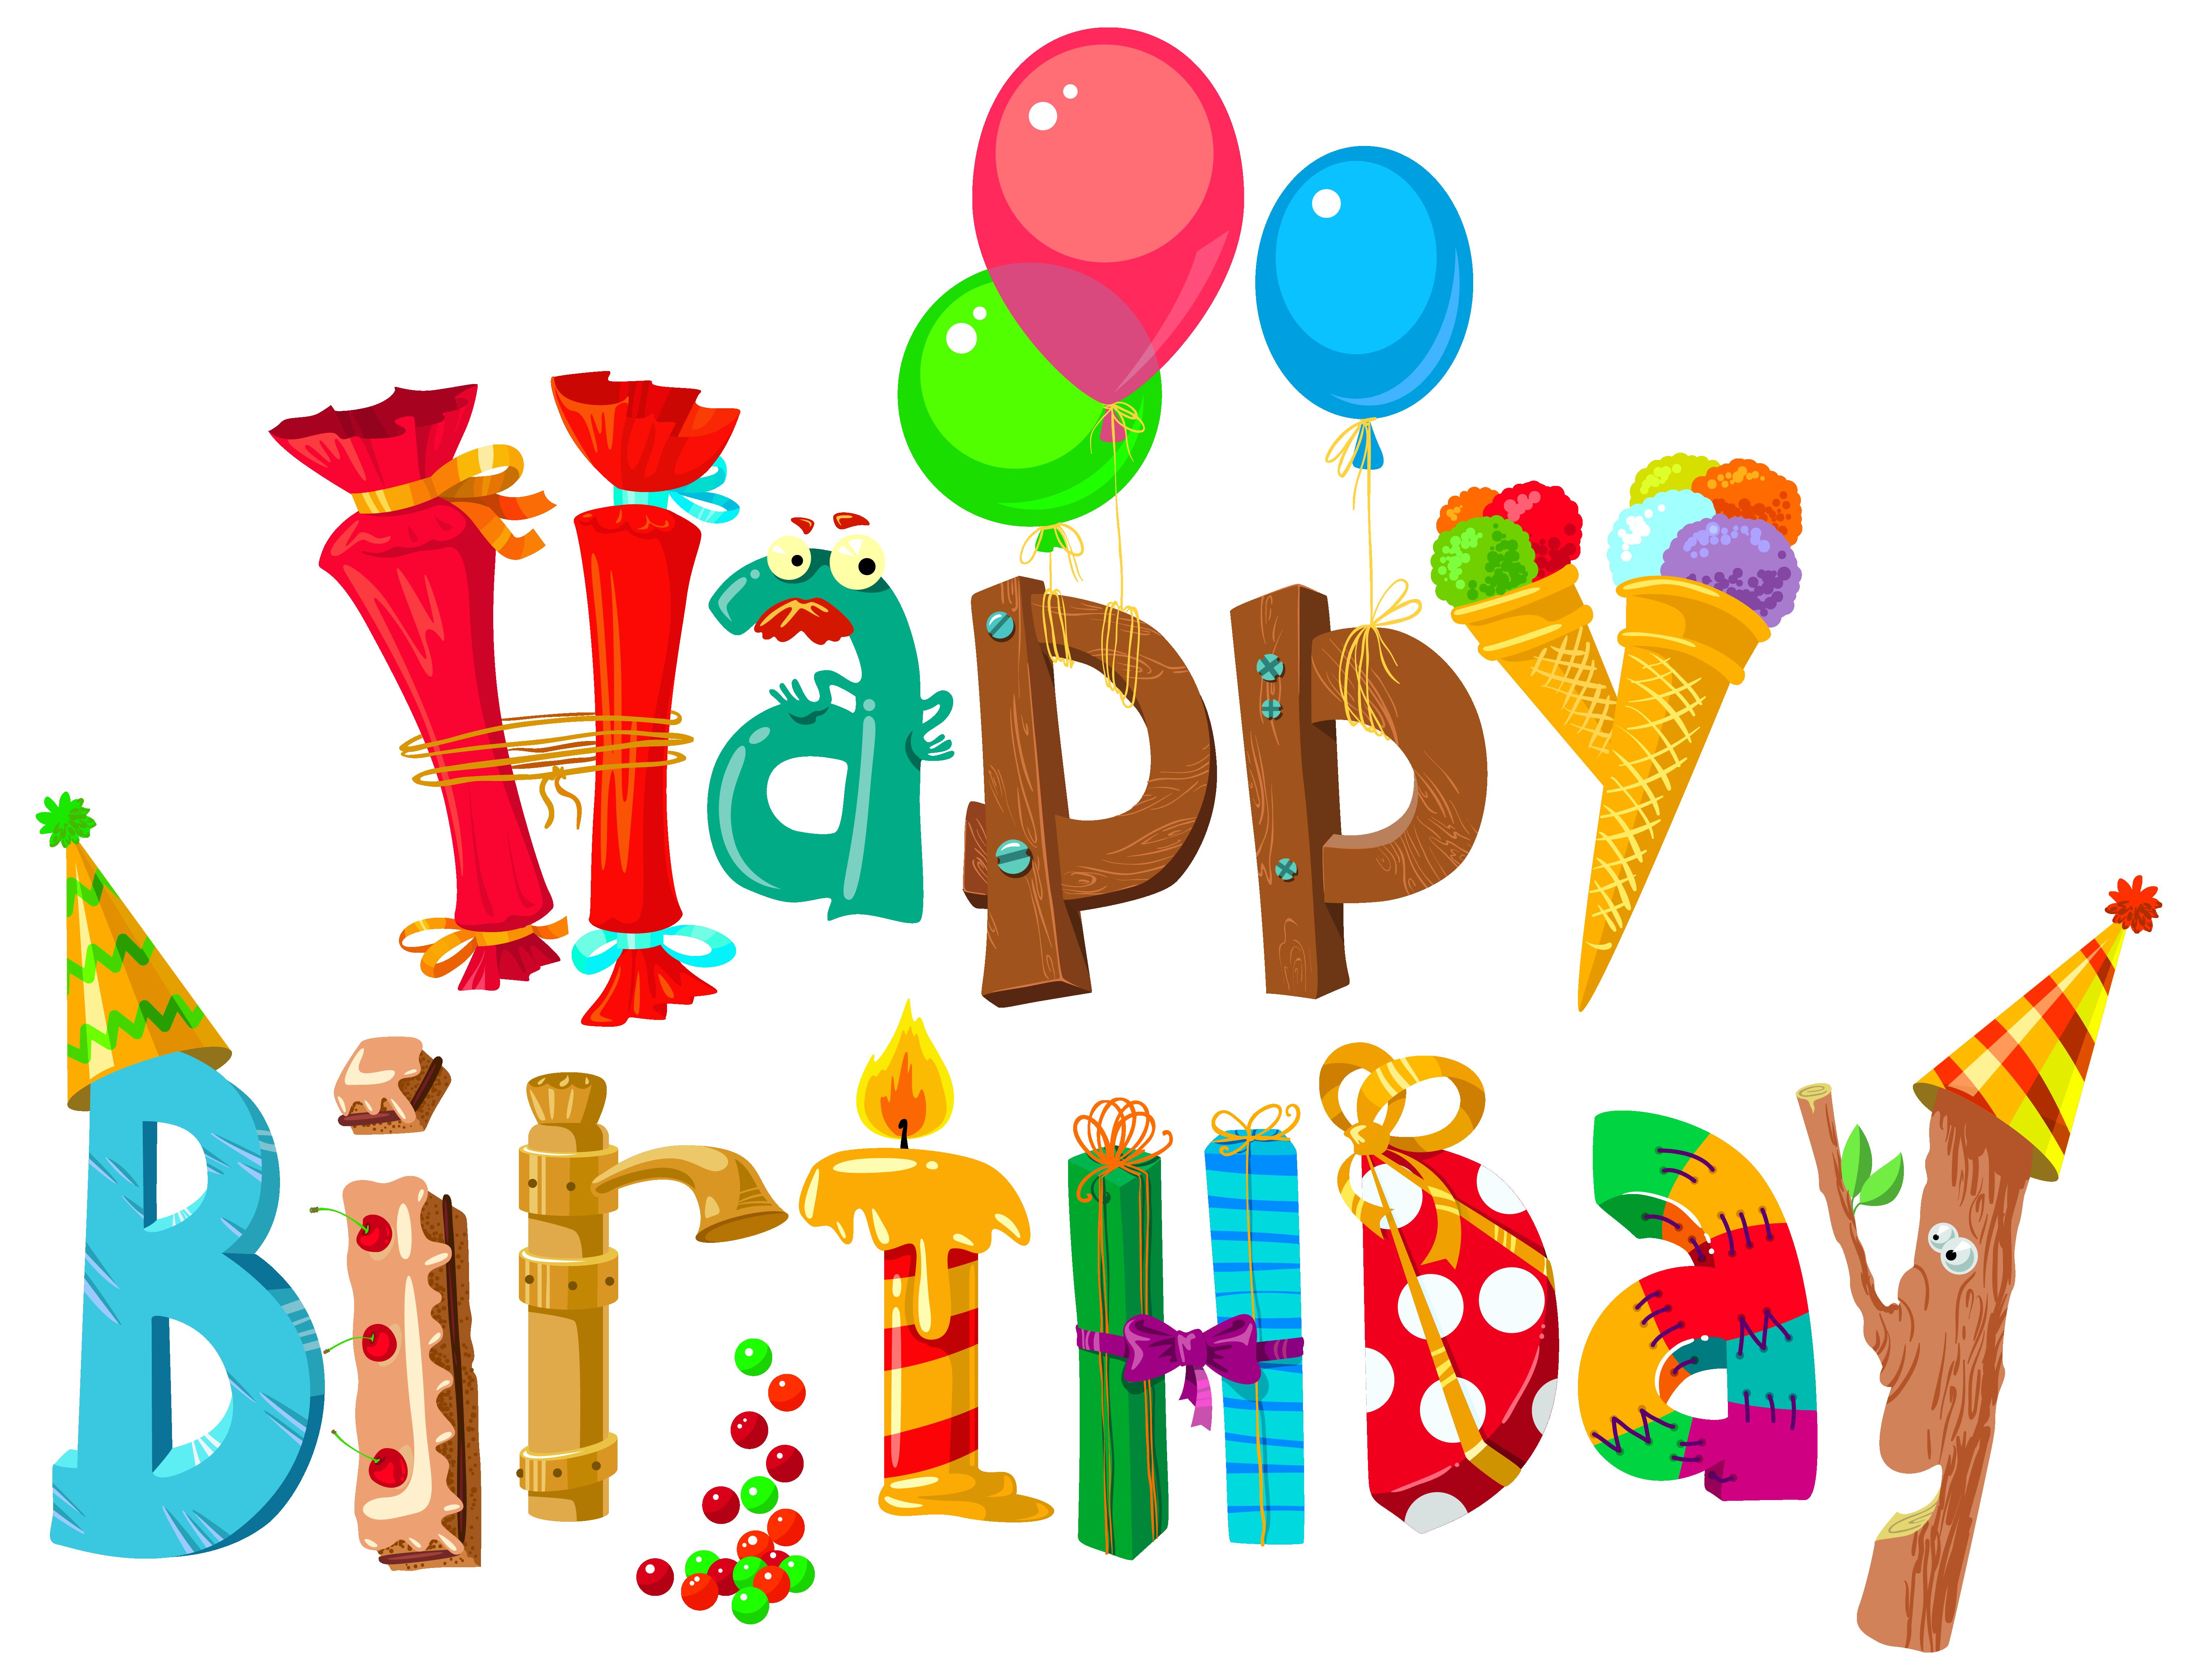 Free Birthday Birthday Clipart .-Free birthday birthday clipart .-7